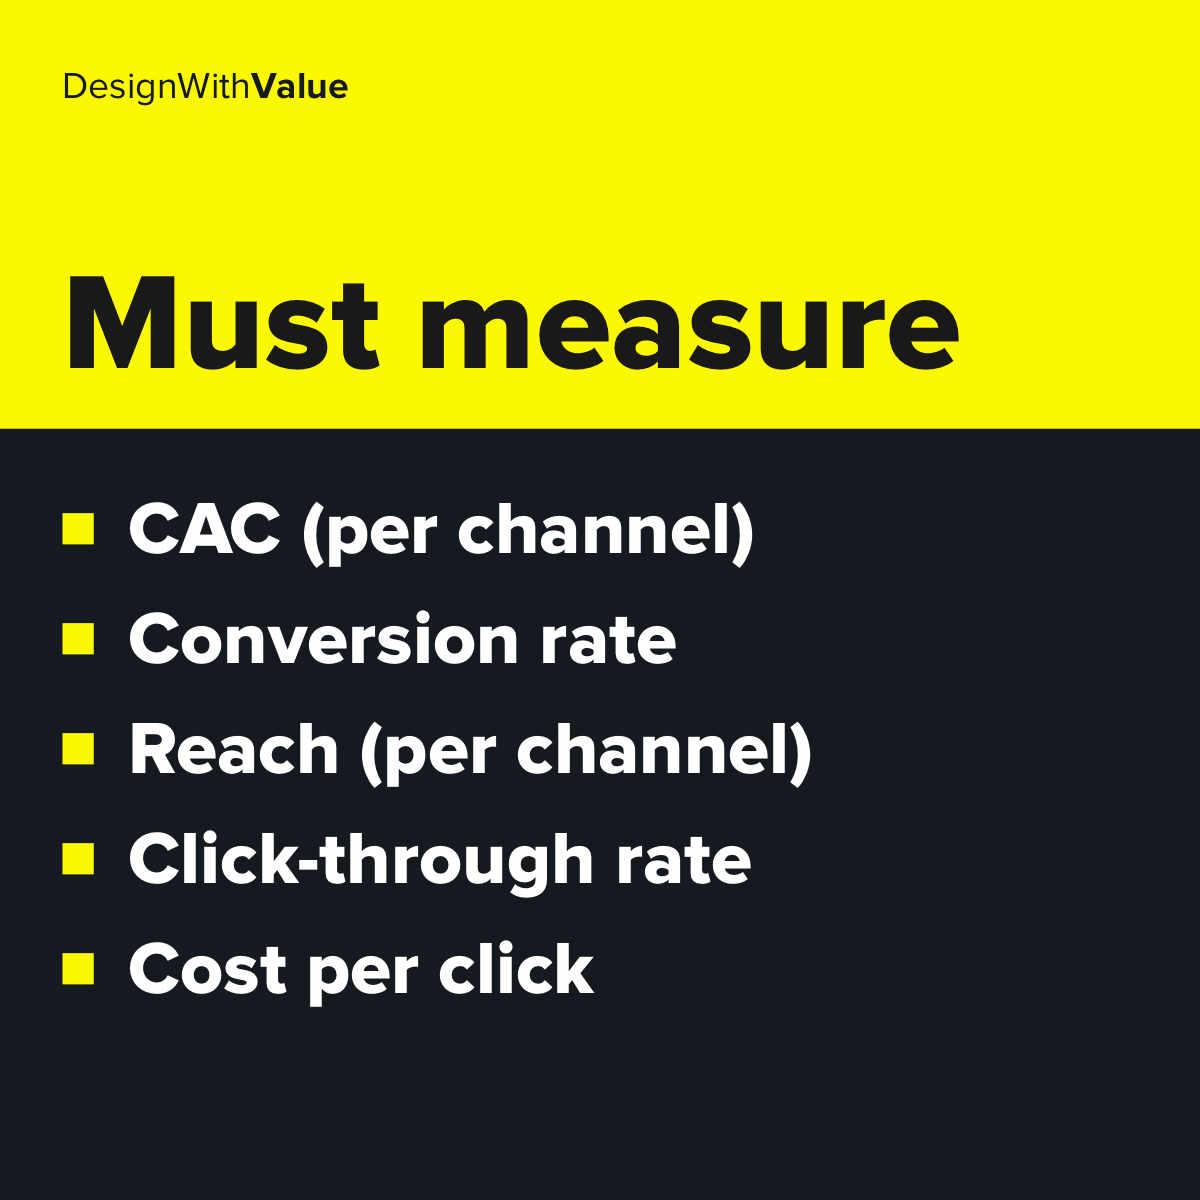 List of metrics: CAC, conversion rate, reach per channel, click through rate, cost per click